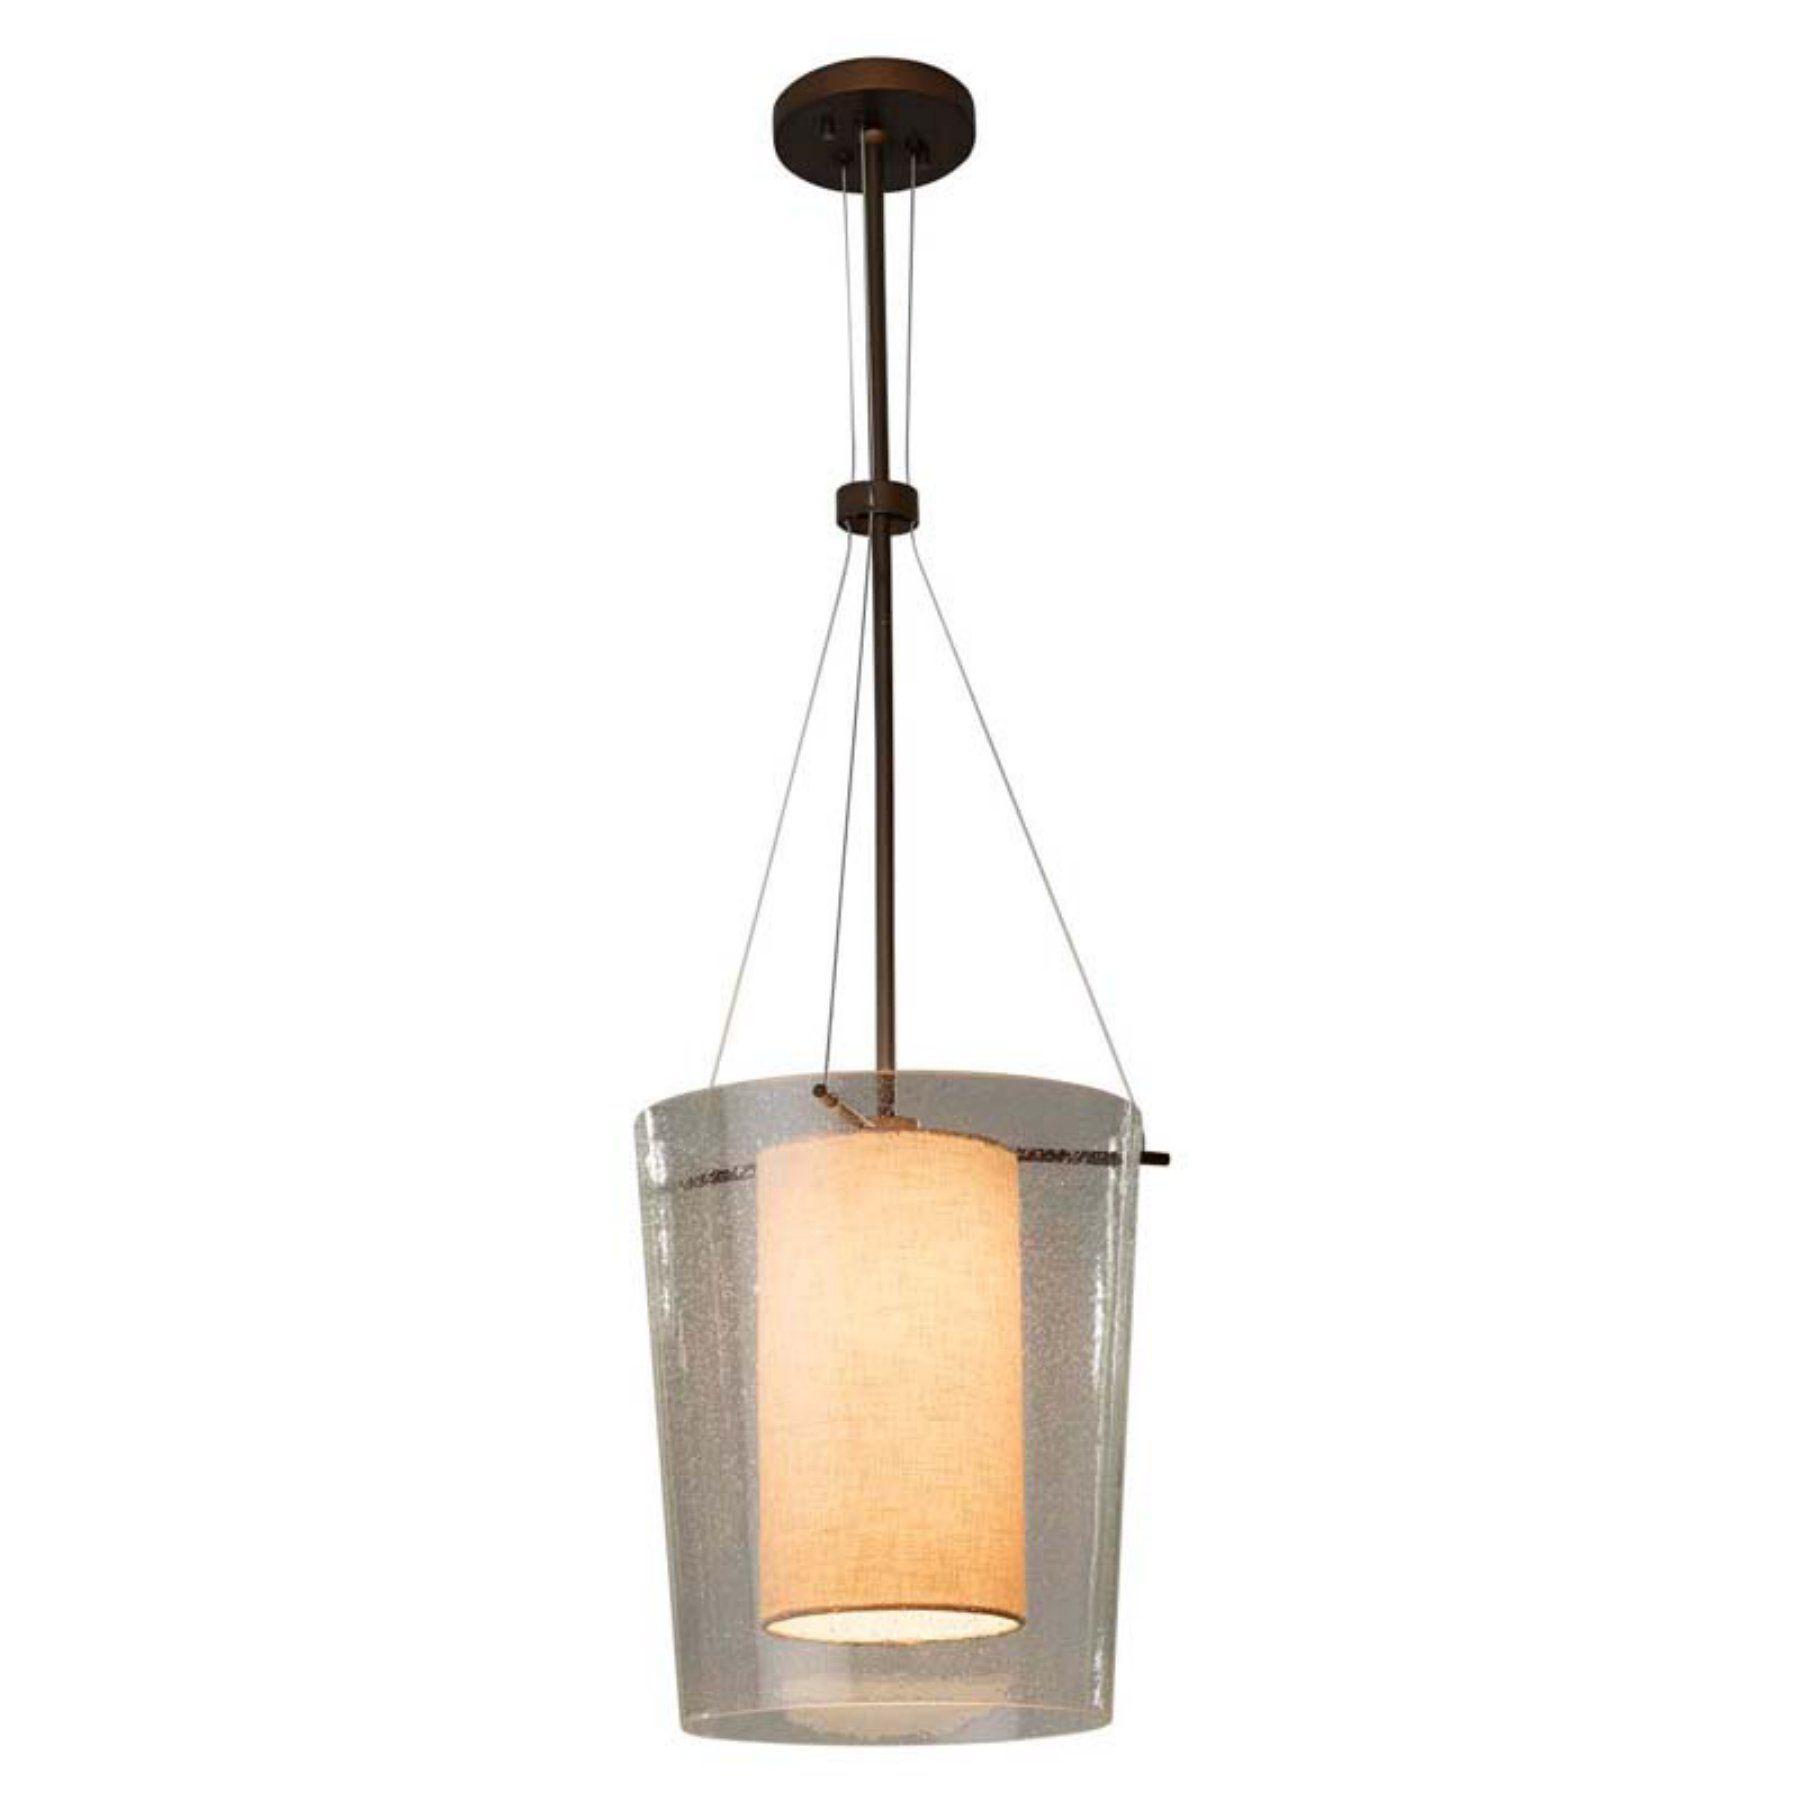 Justice Design Amani 8010 Pendant Light  Fab 8010 Crem Nckl Led1